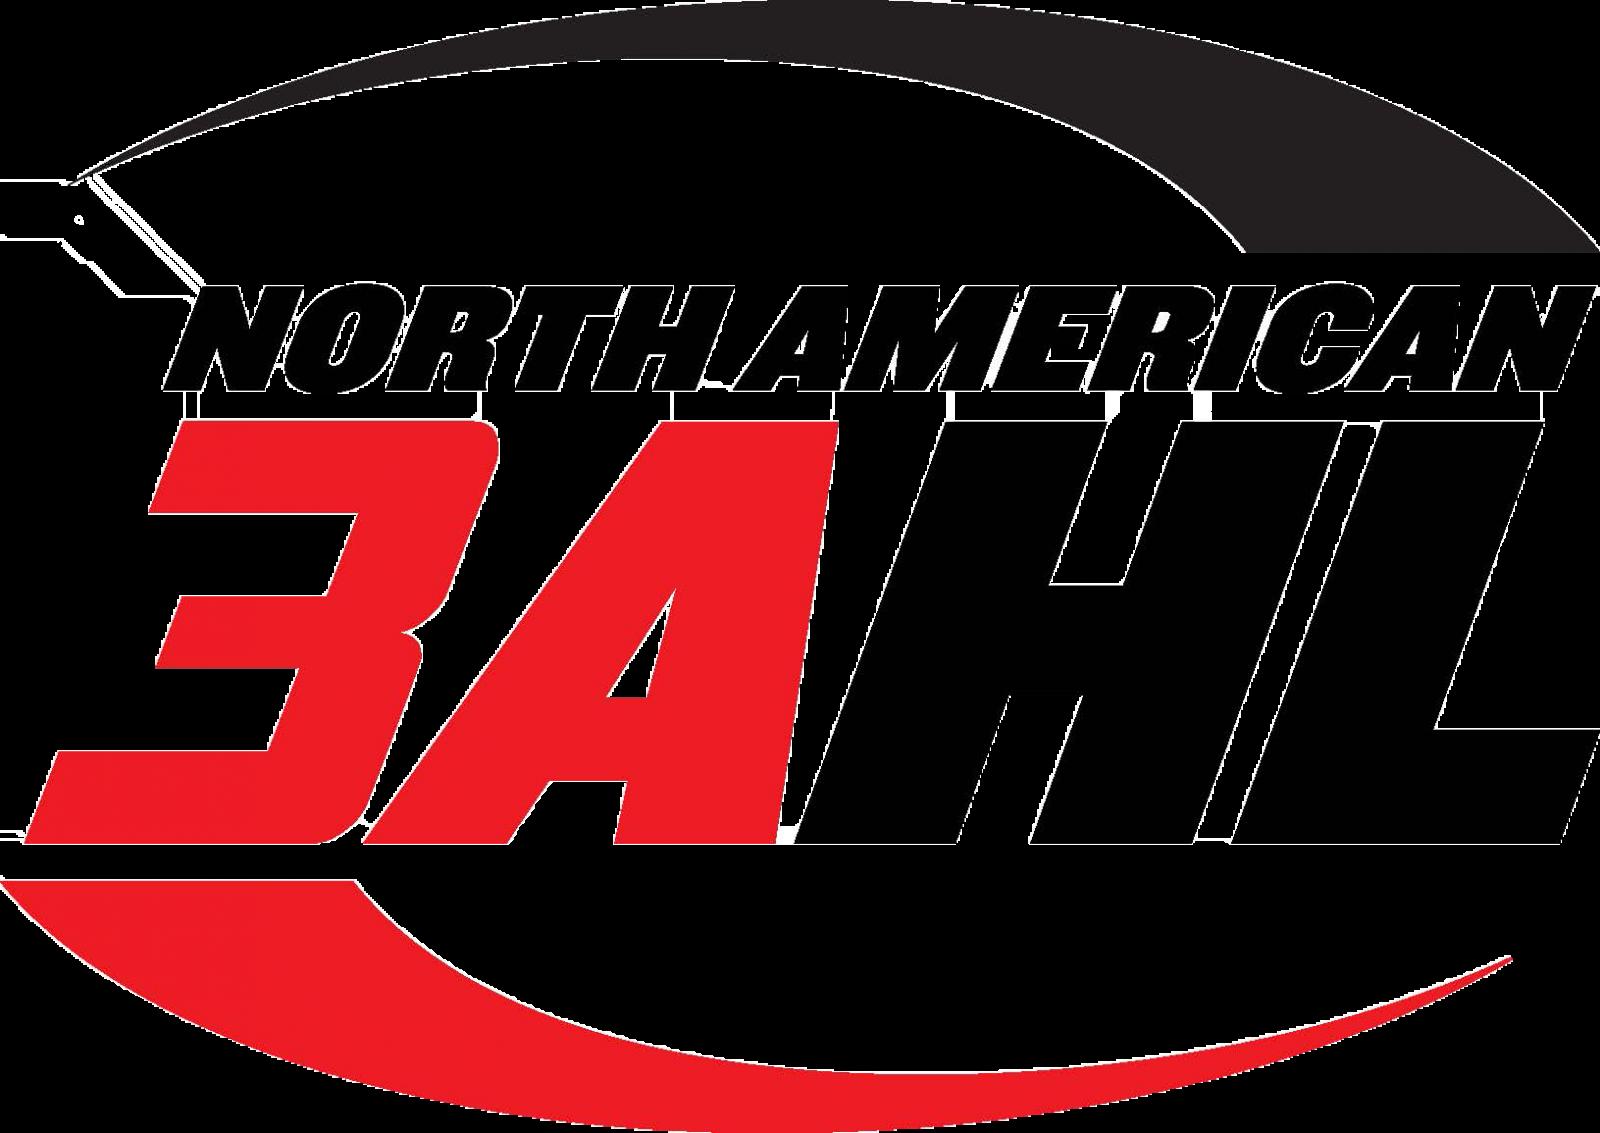 North American 3 Atlantic Hockey League